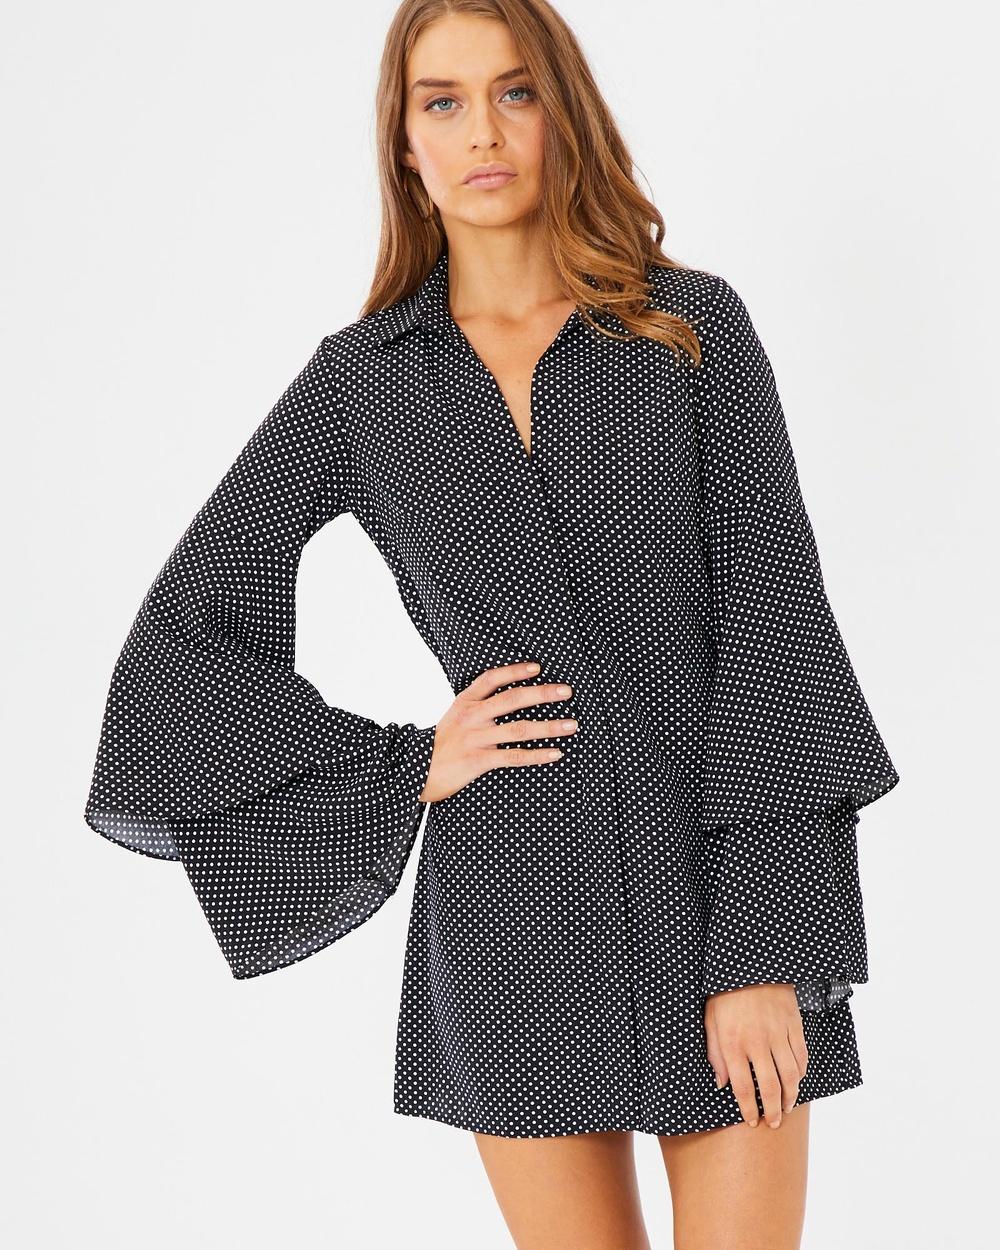 Tussah Paola Shirt Dress Printed Dresses Black Paola Shirt Dress